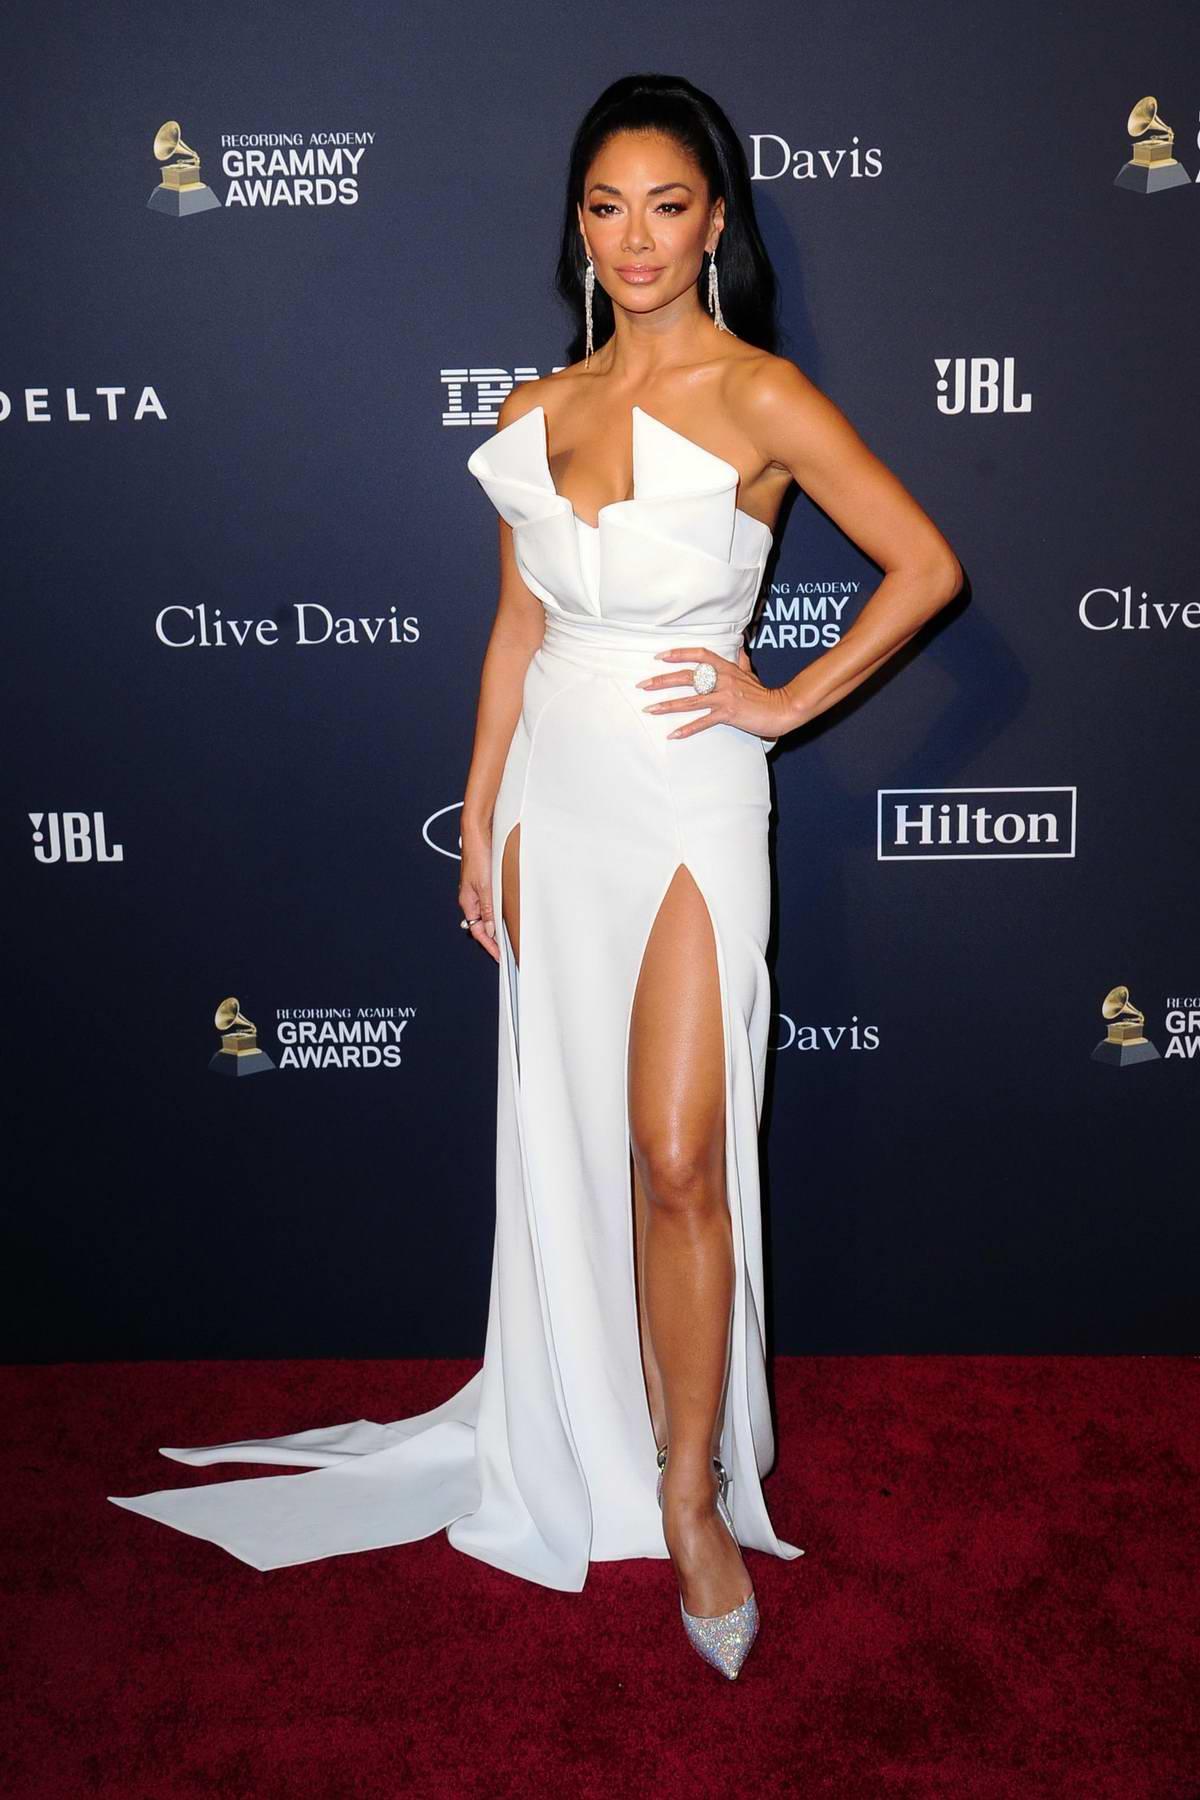 Nicole Scherzinger attends the Recording Academy and Clive Davis Pre-Grammy Gala in Beverly Hills, California